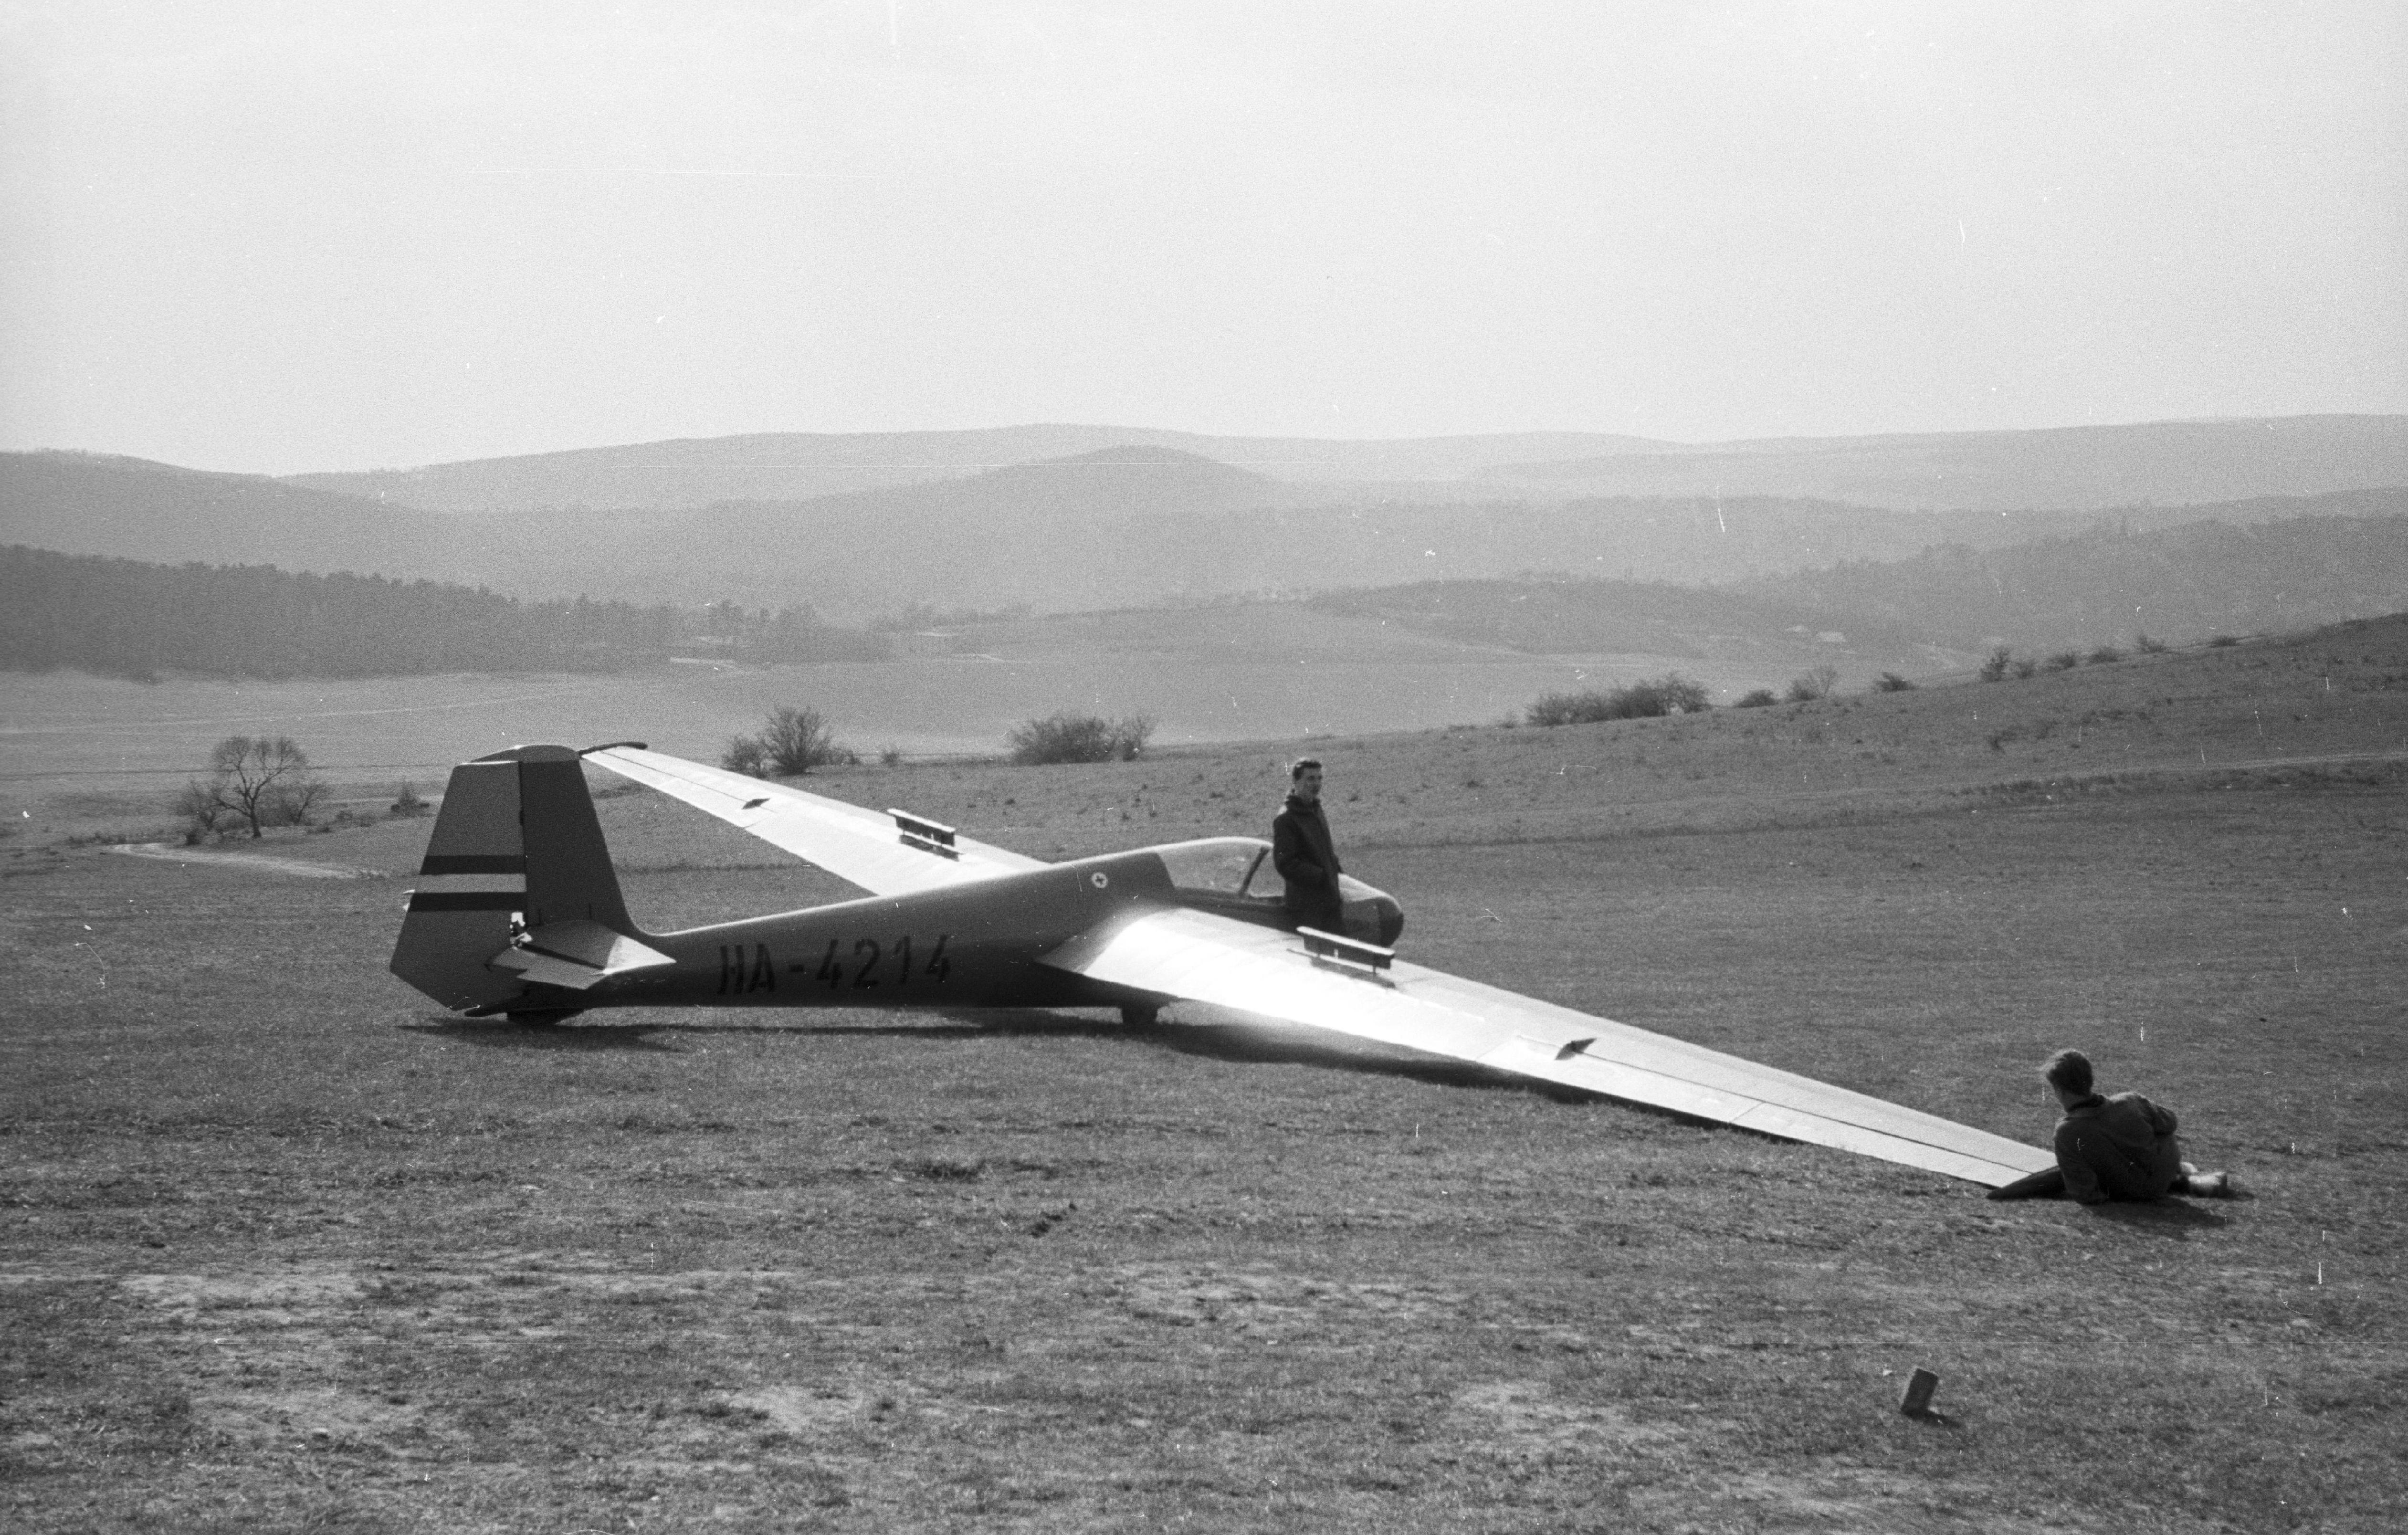 File Rubik R-22SV Super Futár C vitorlázó repülőgép. Fortepan 31477 ... b44fa12bbe